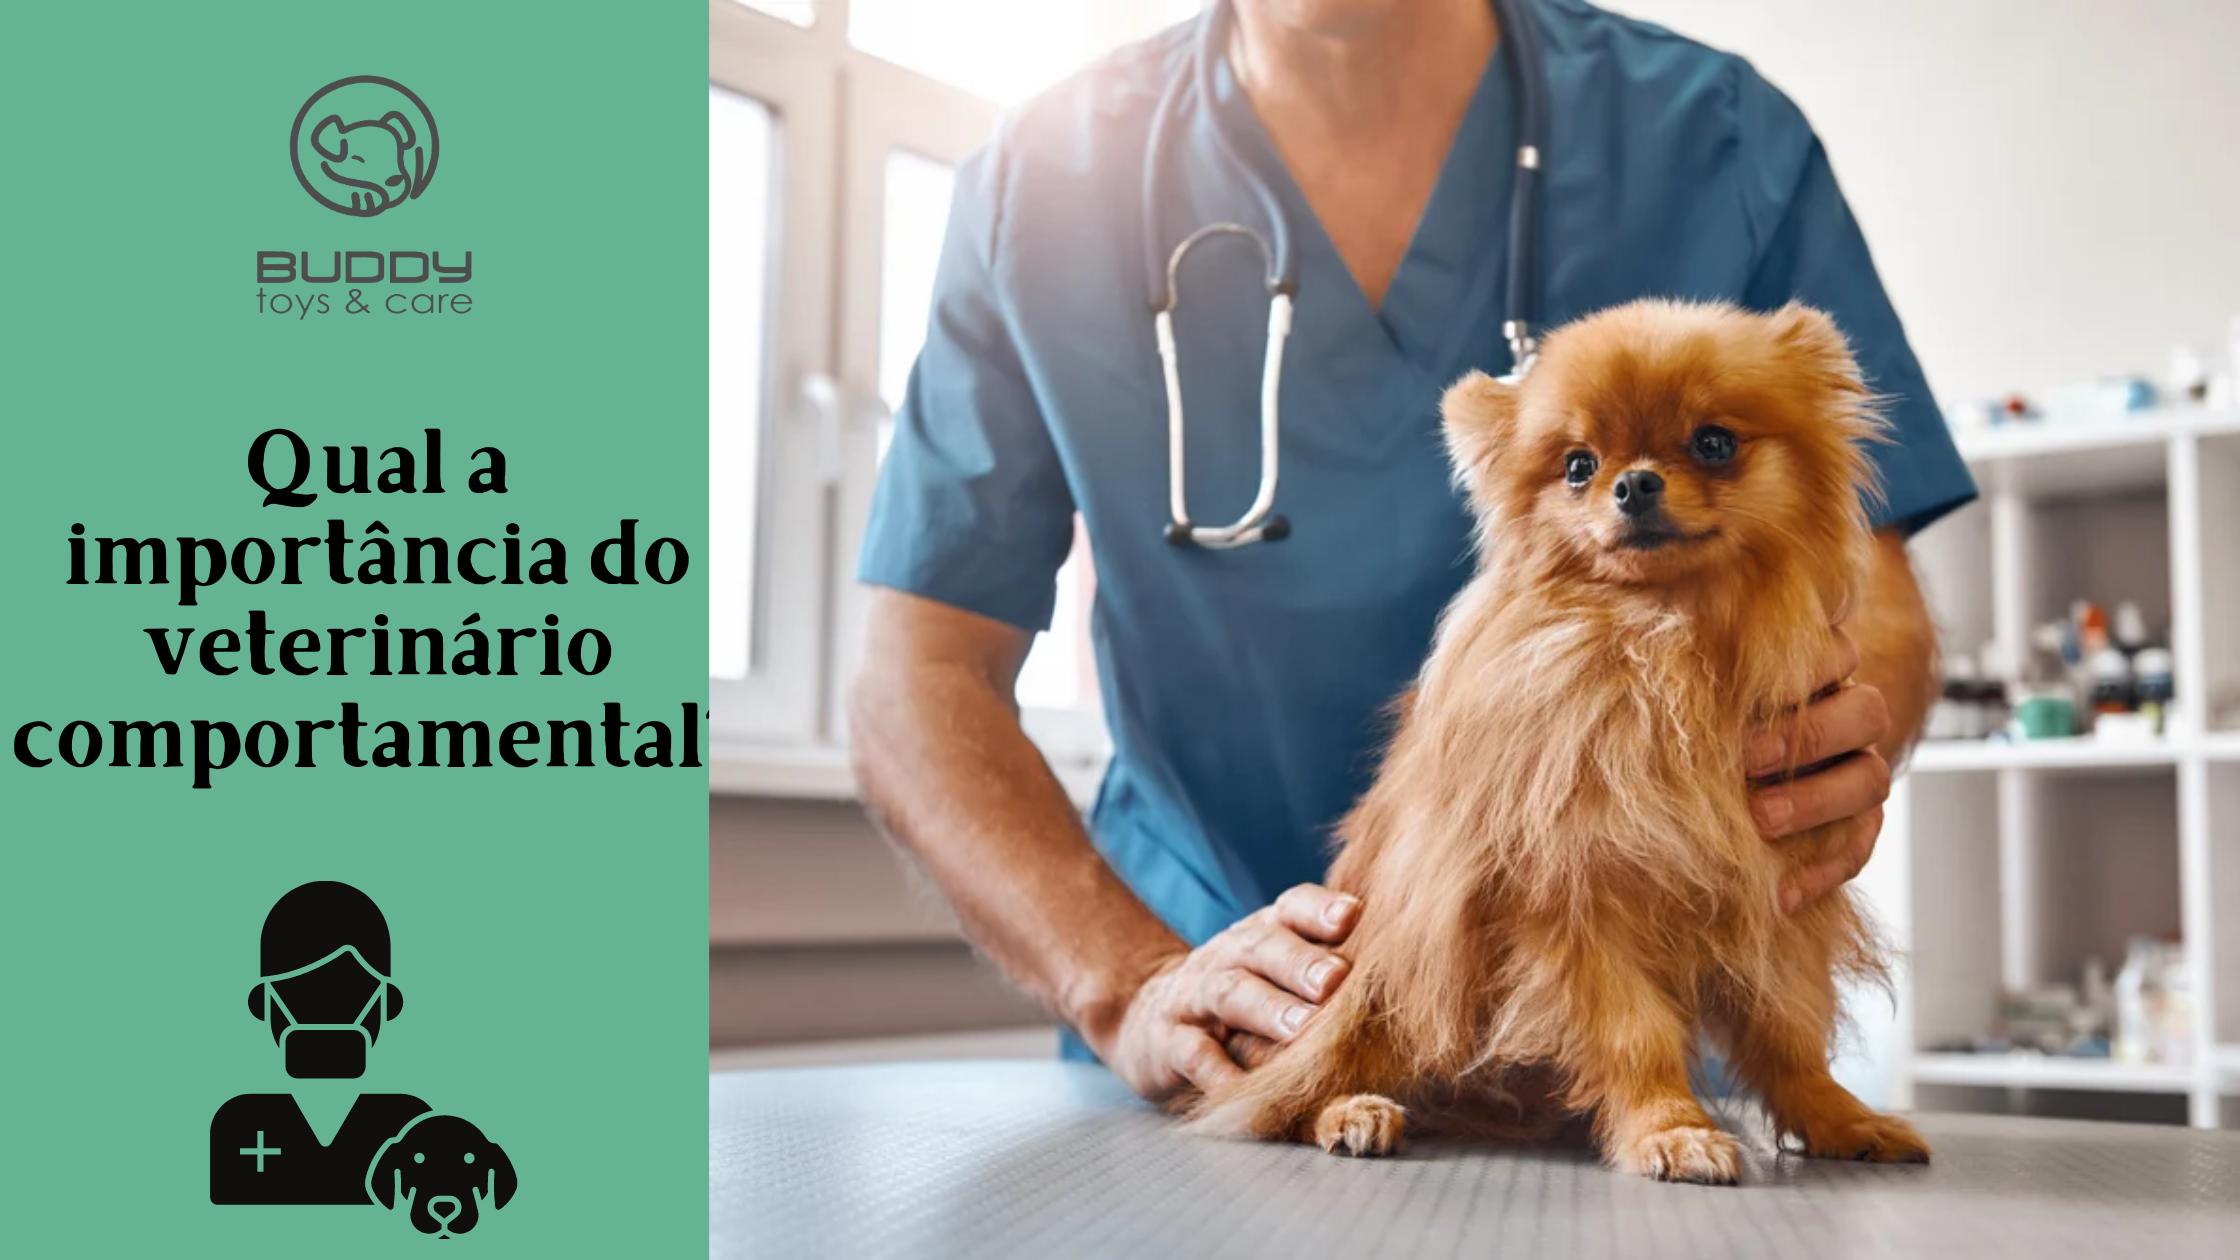 Qual a importância do vet comportamental?